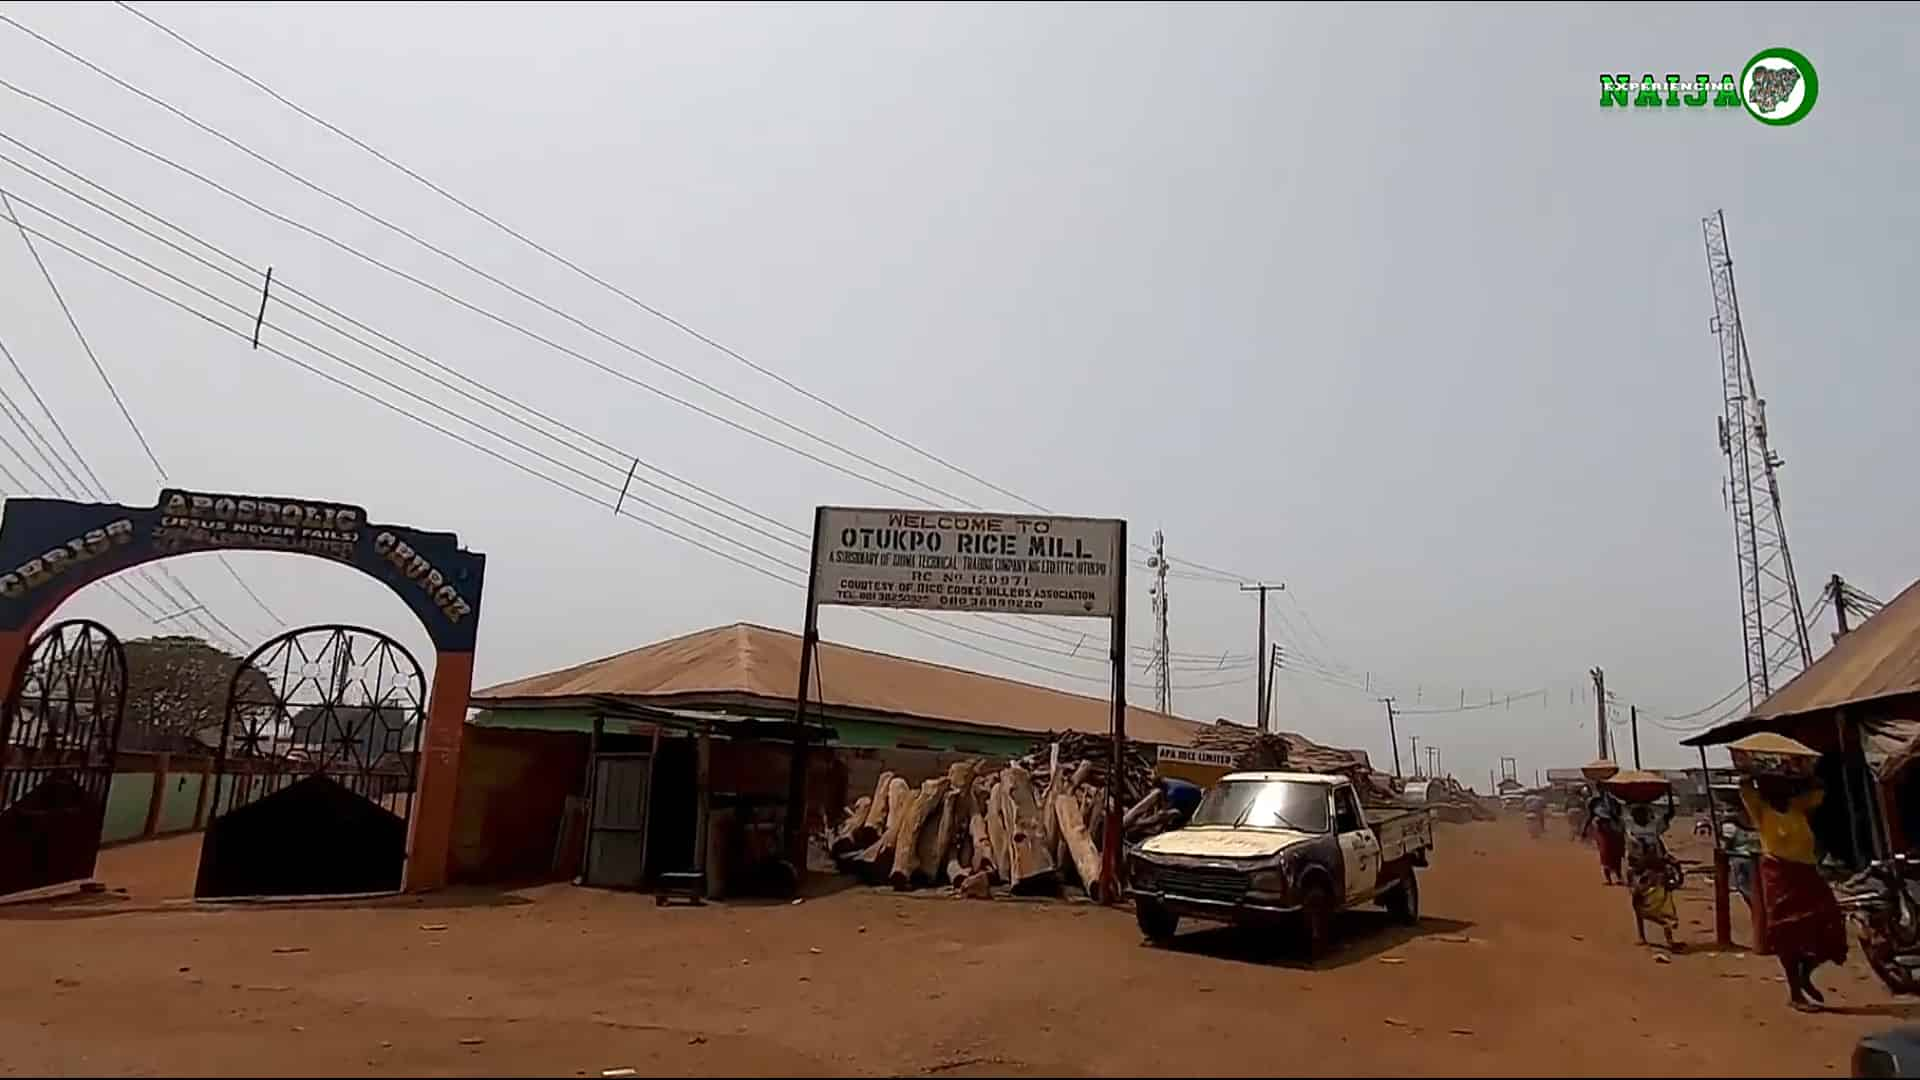 Otukpo Rice Mill, Benue State, Nigeria